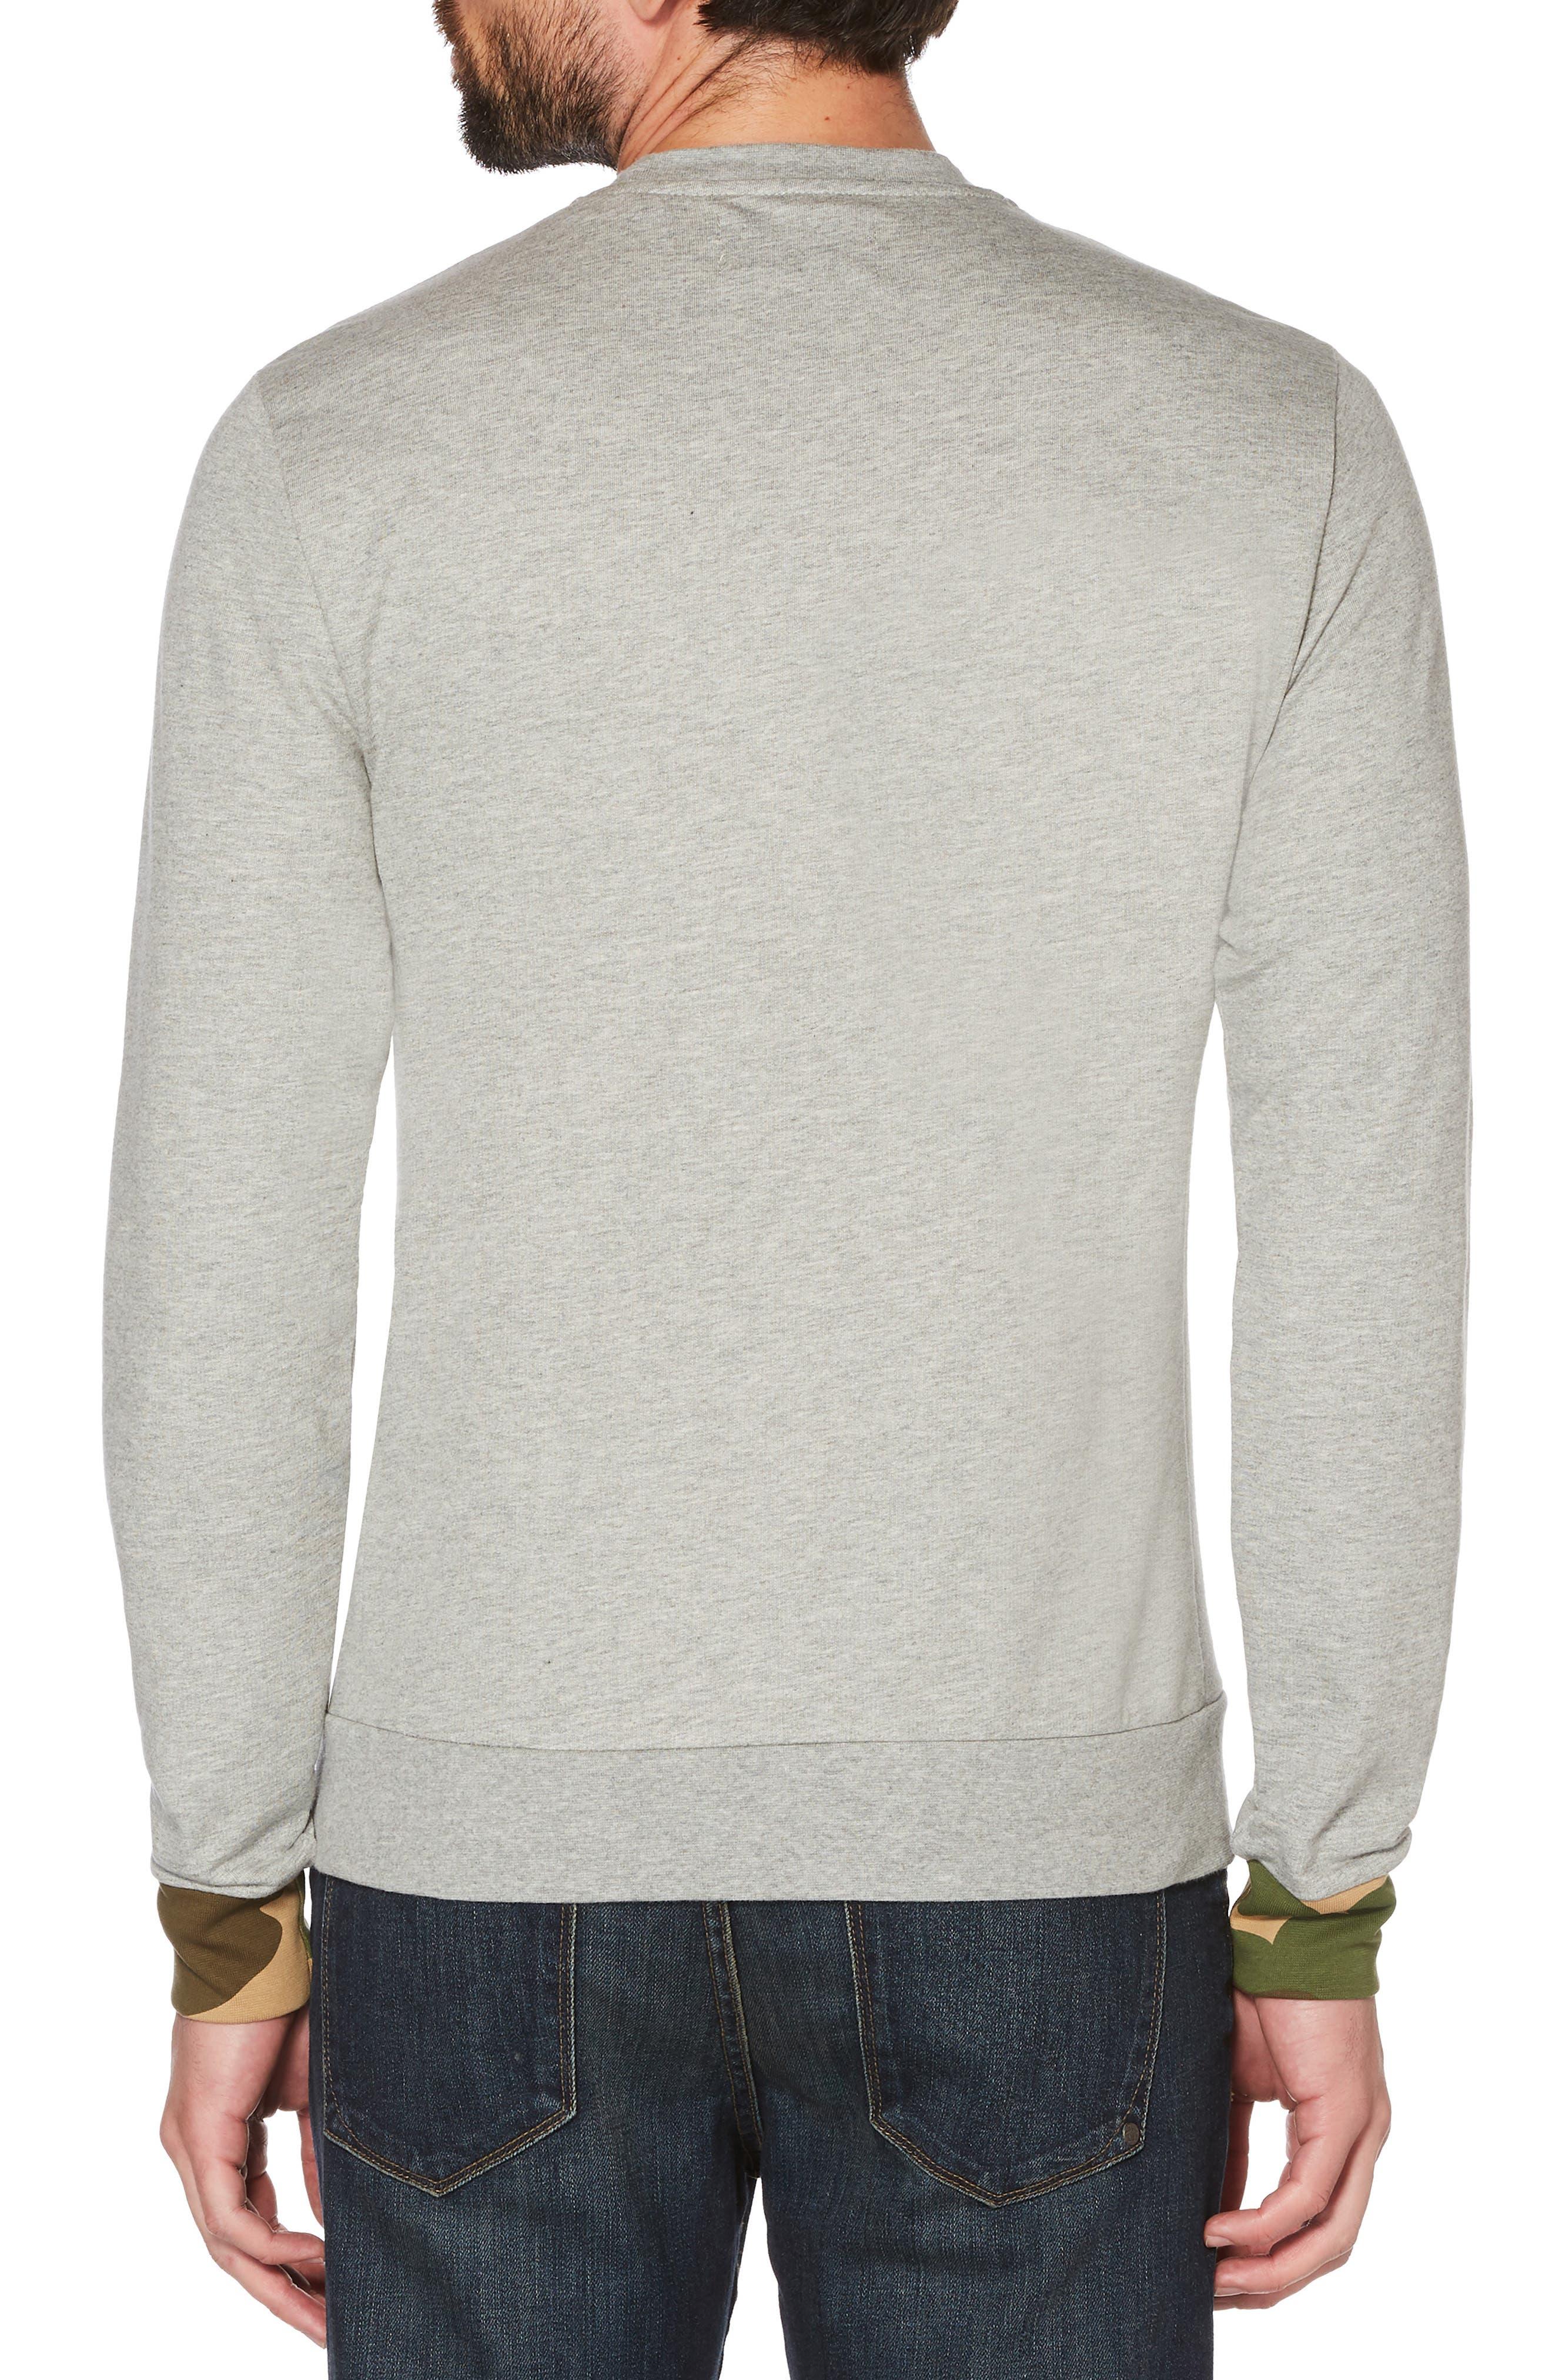 Camo Cuff Sweatshirt,                             Alternate thumbnail 2, color,                             RAIN HEATHER